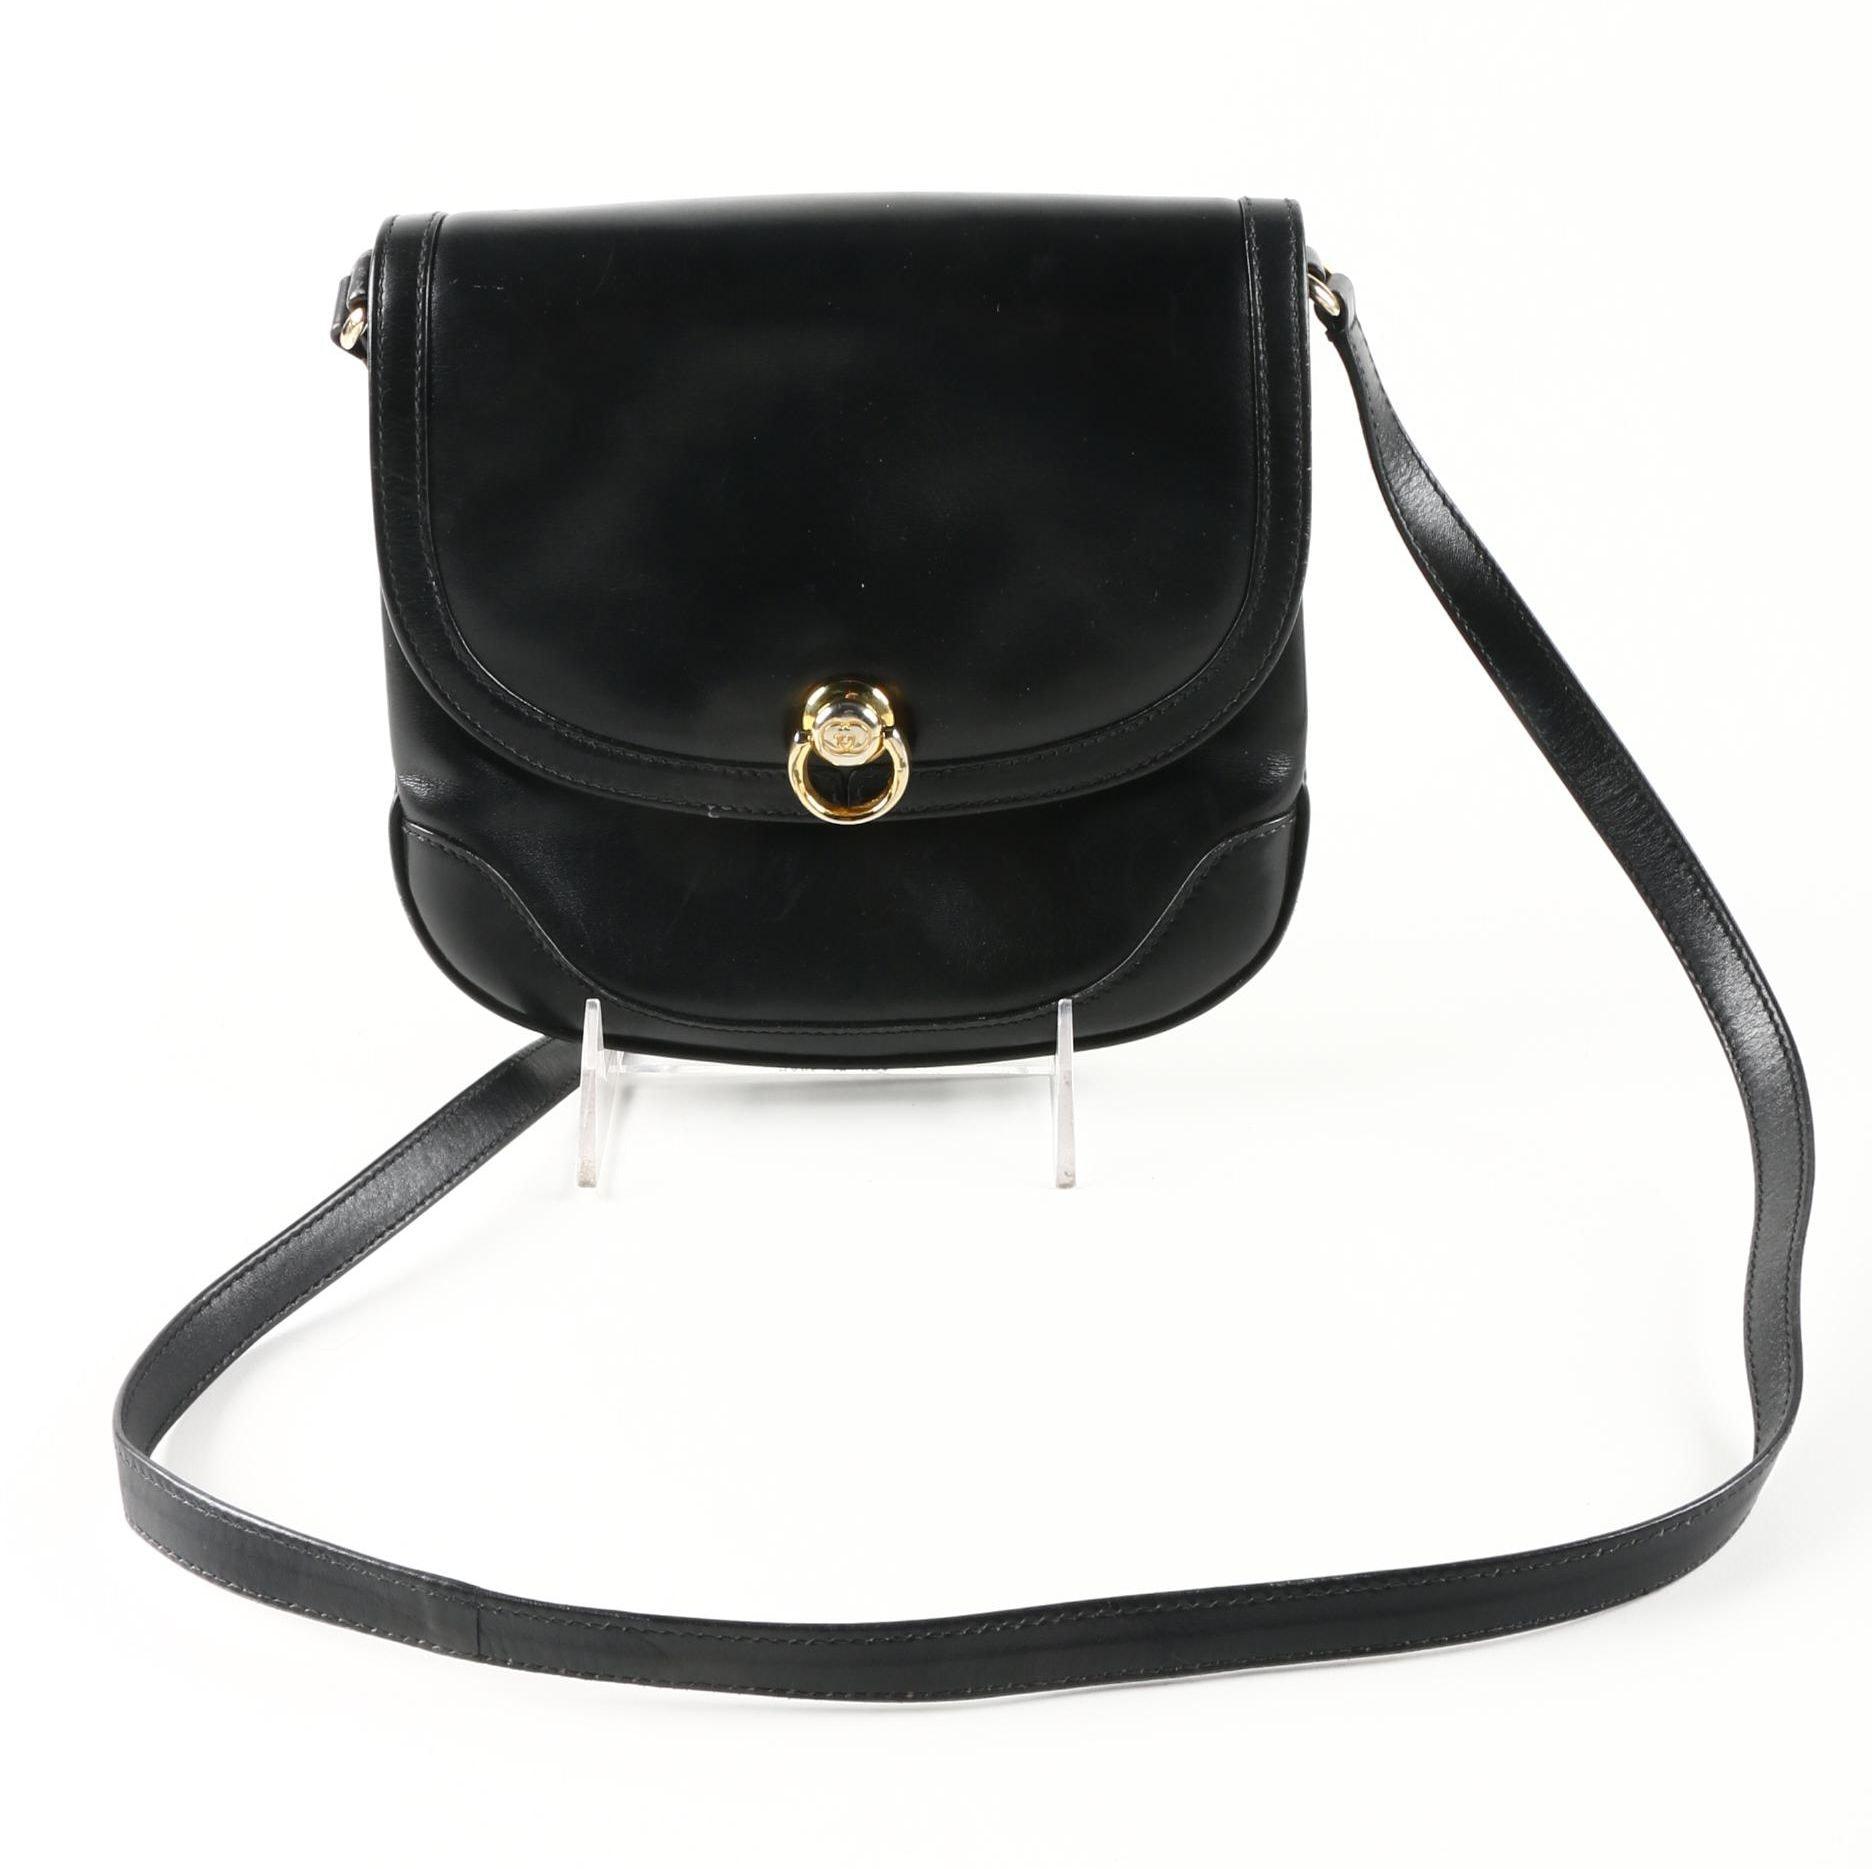 Vintage Gucci Boutique Black Leather Crossbody Bag